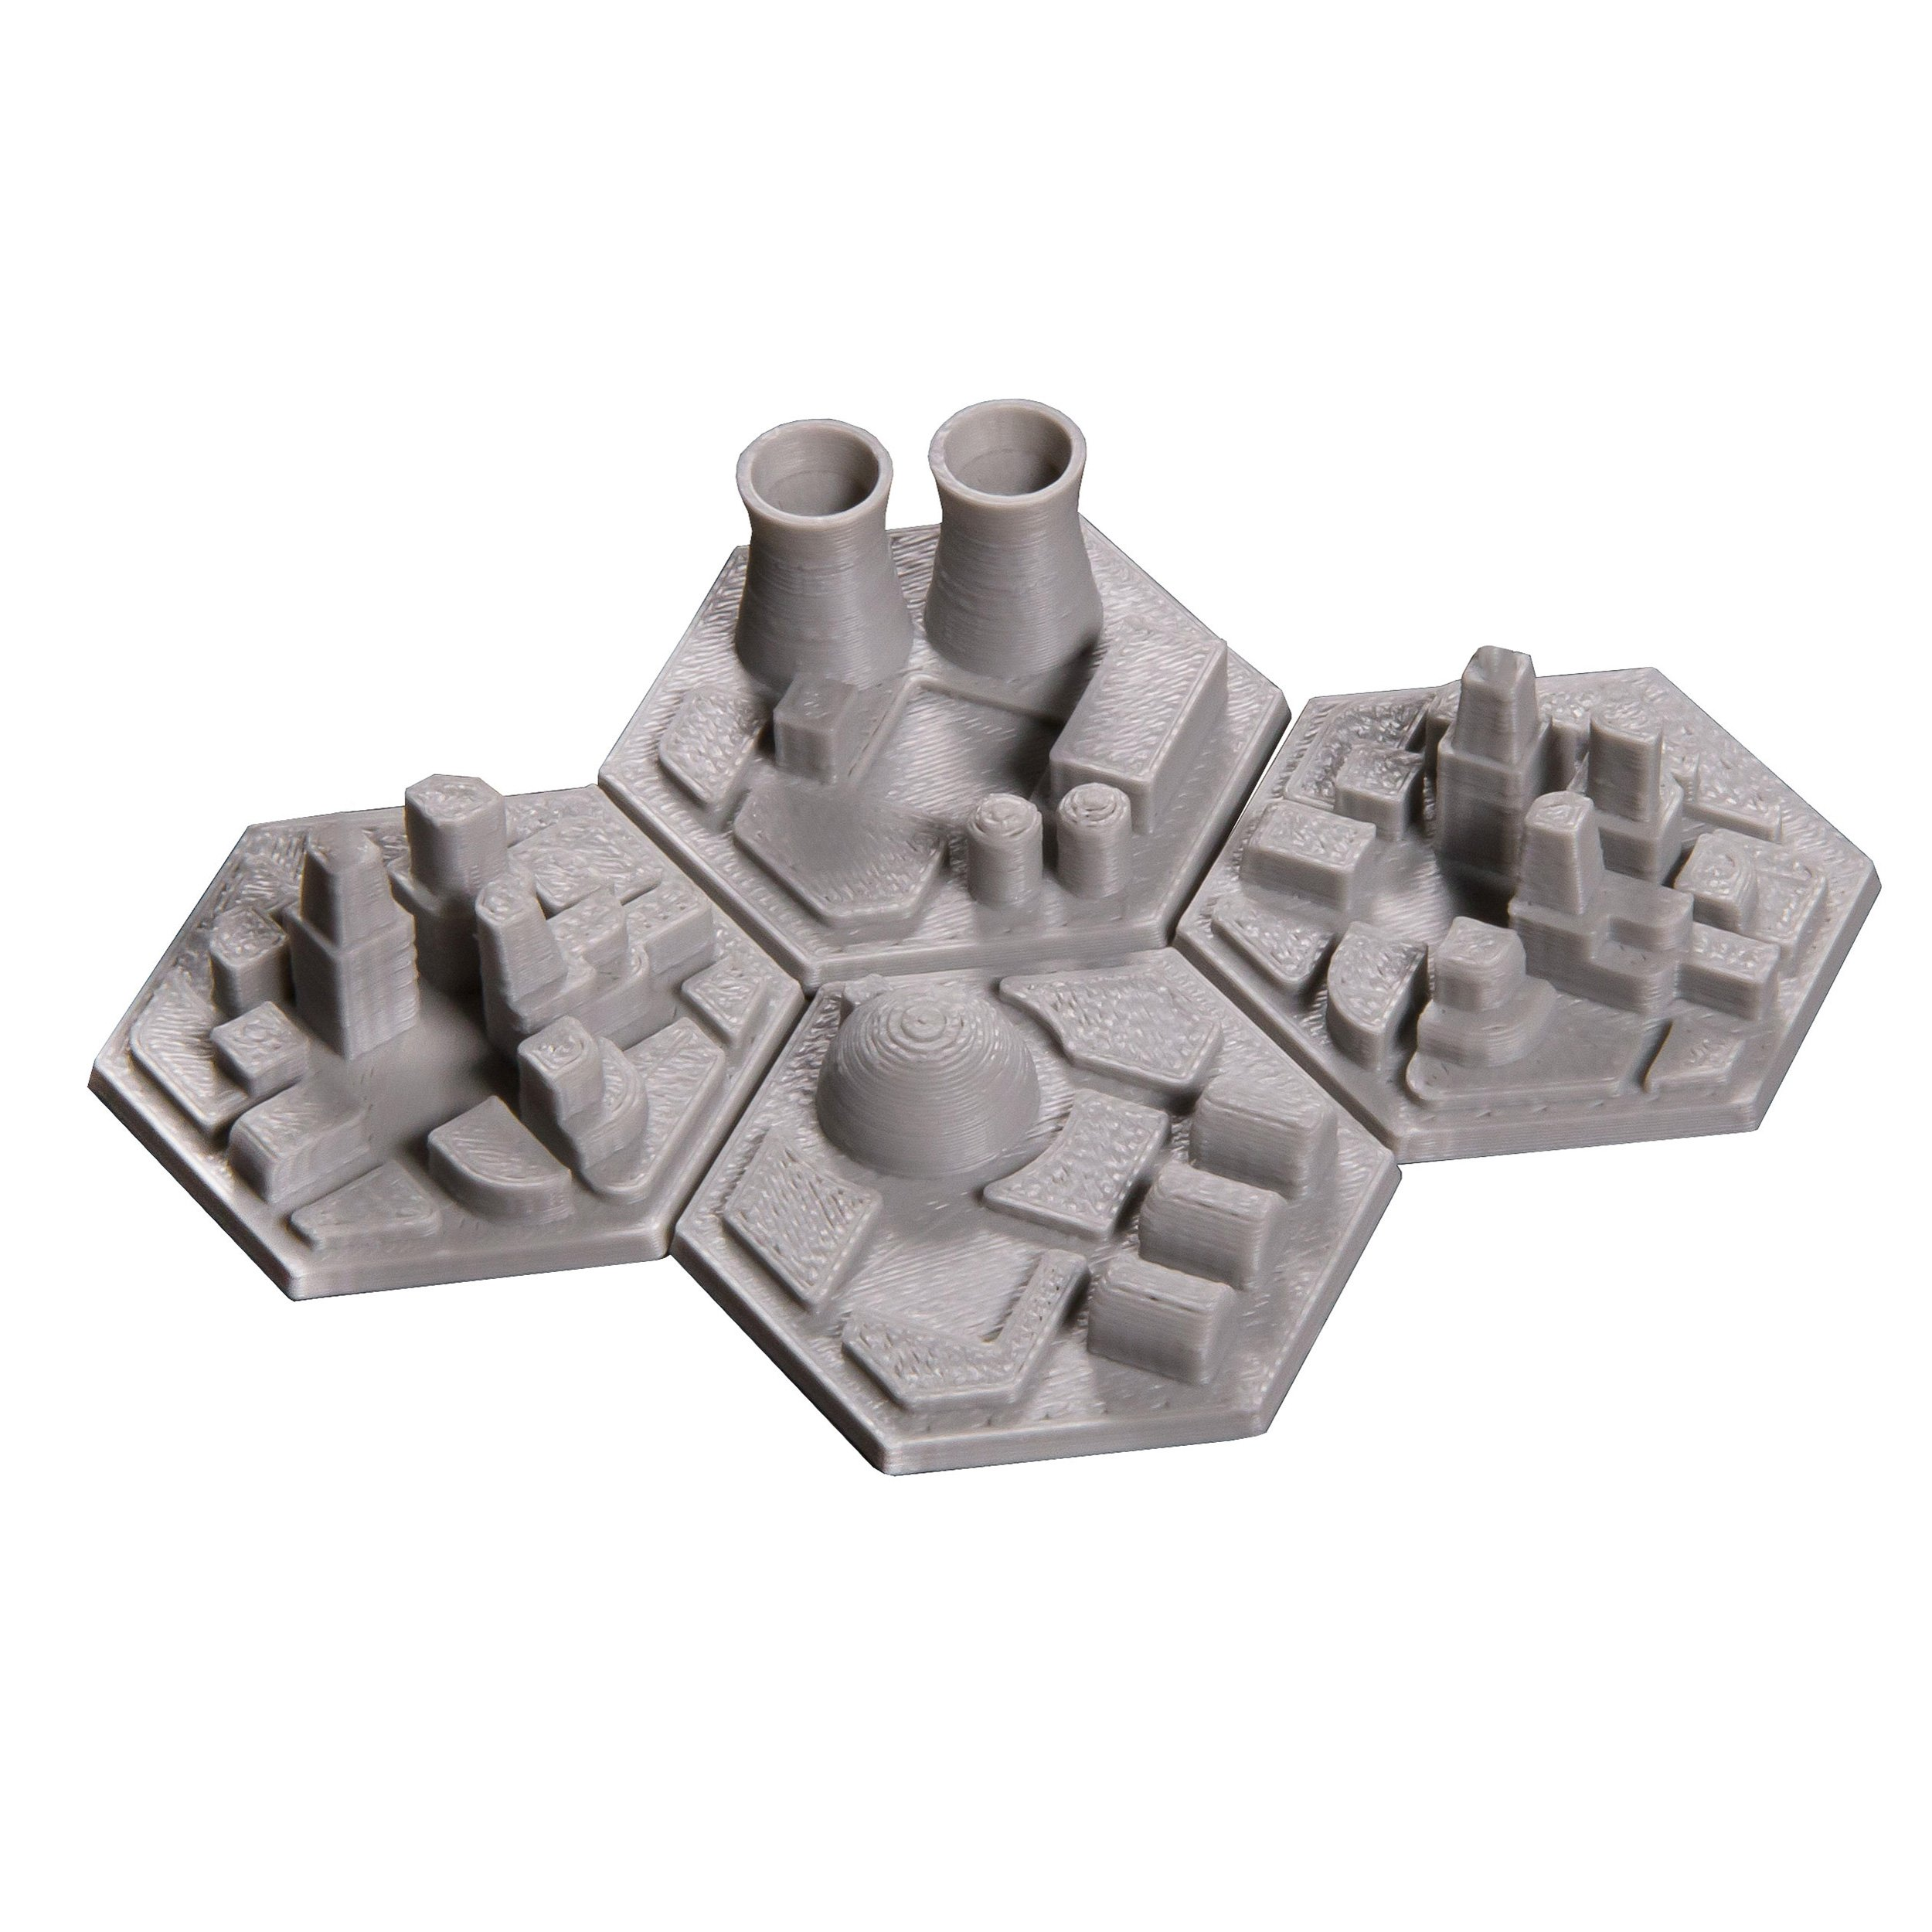 The Broken Token 3D Space Colony Hex Tiles for Terraforming Mars (4)